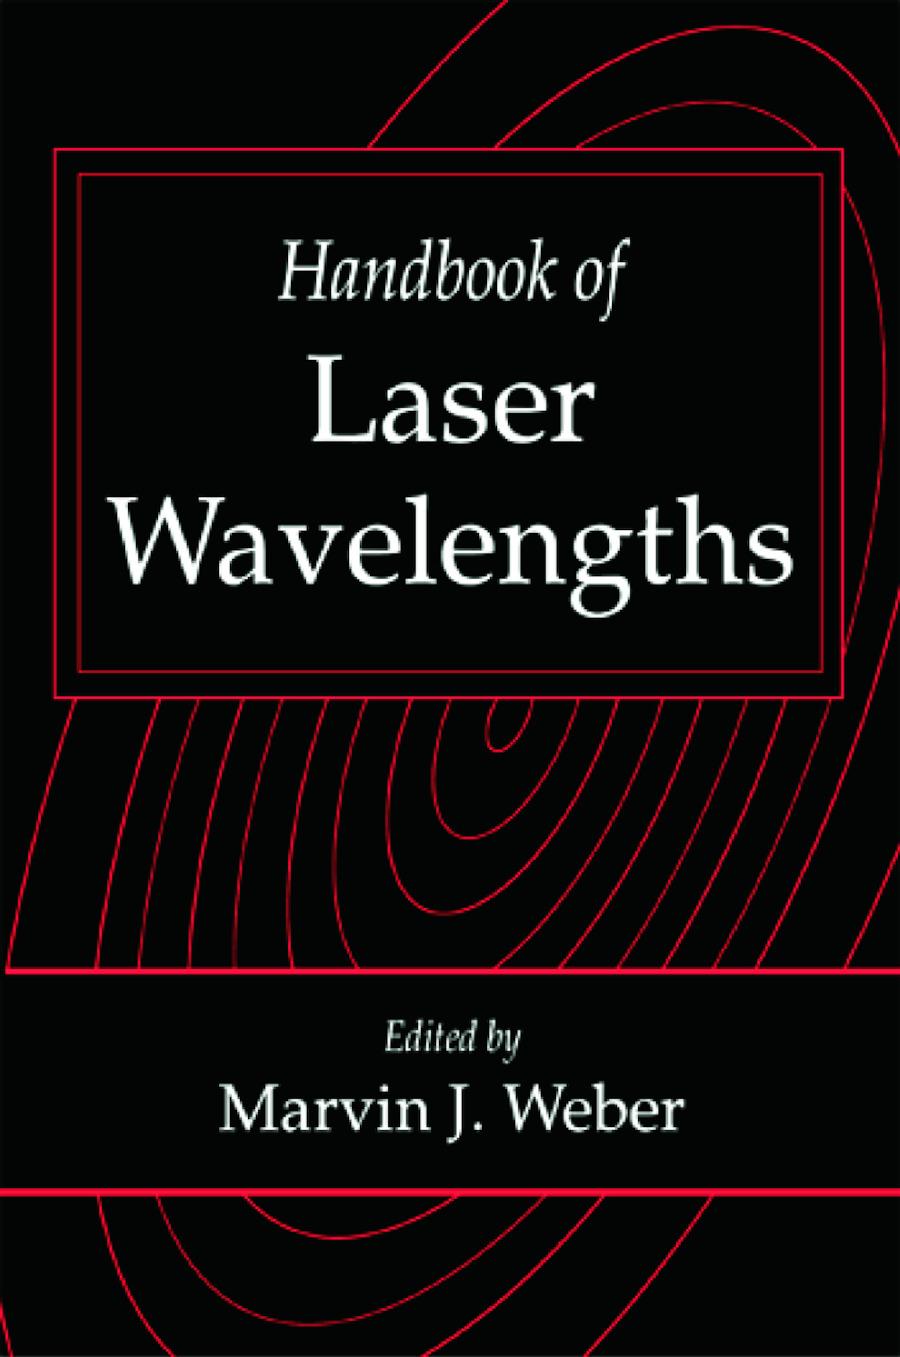 Handbook of Laser Wavelengths